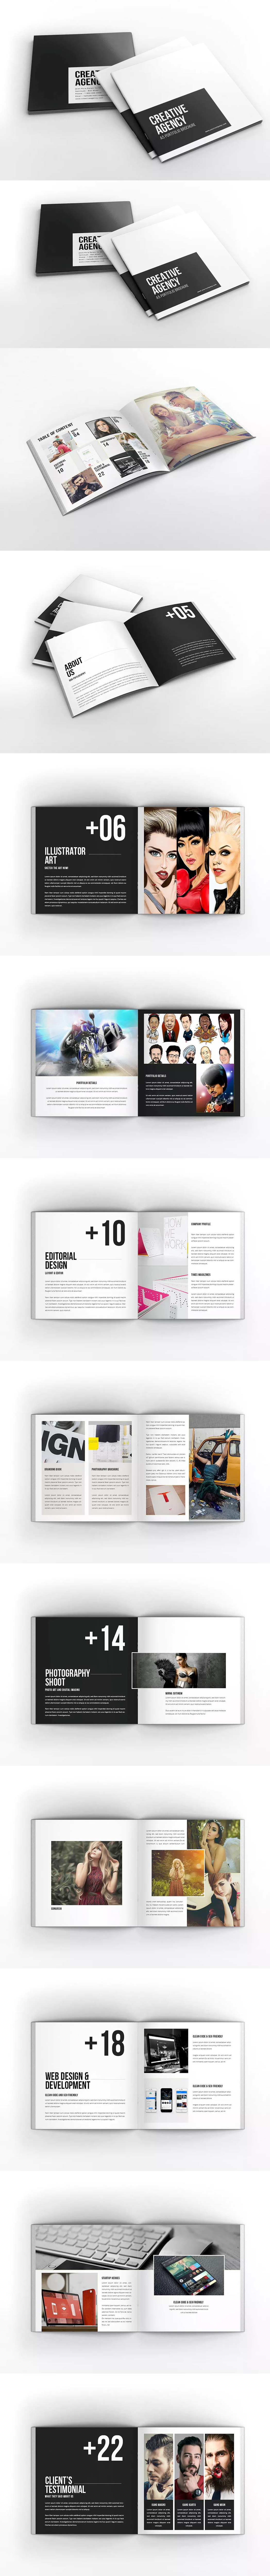 Creative Agency - Square Portfolio Brochure Template InDesign INDD ...